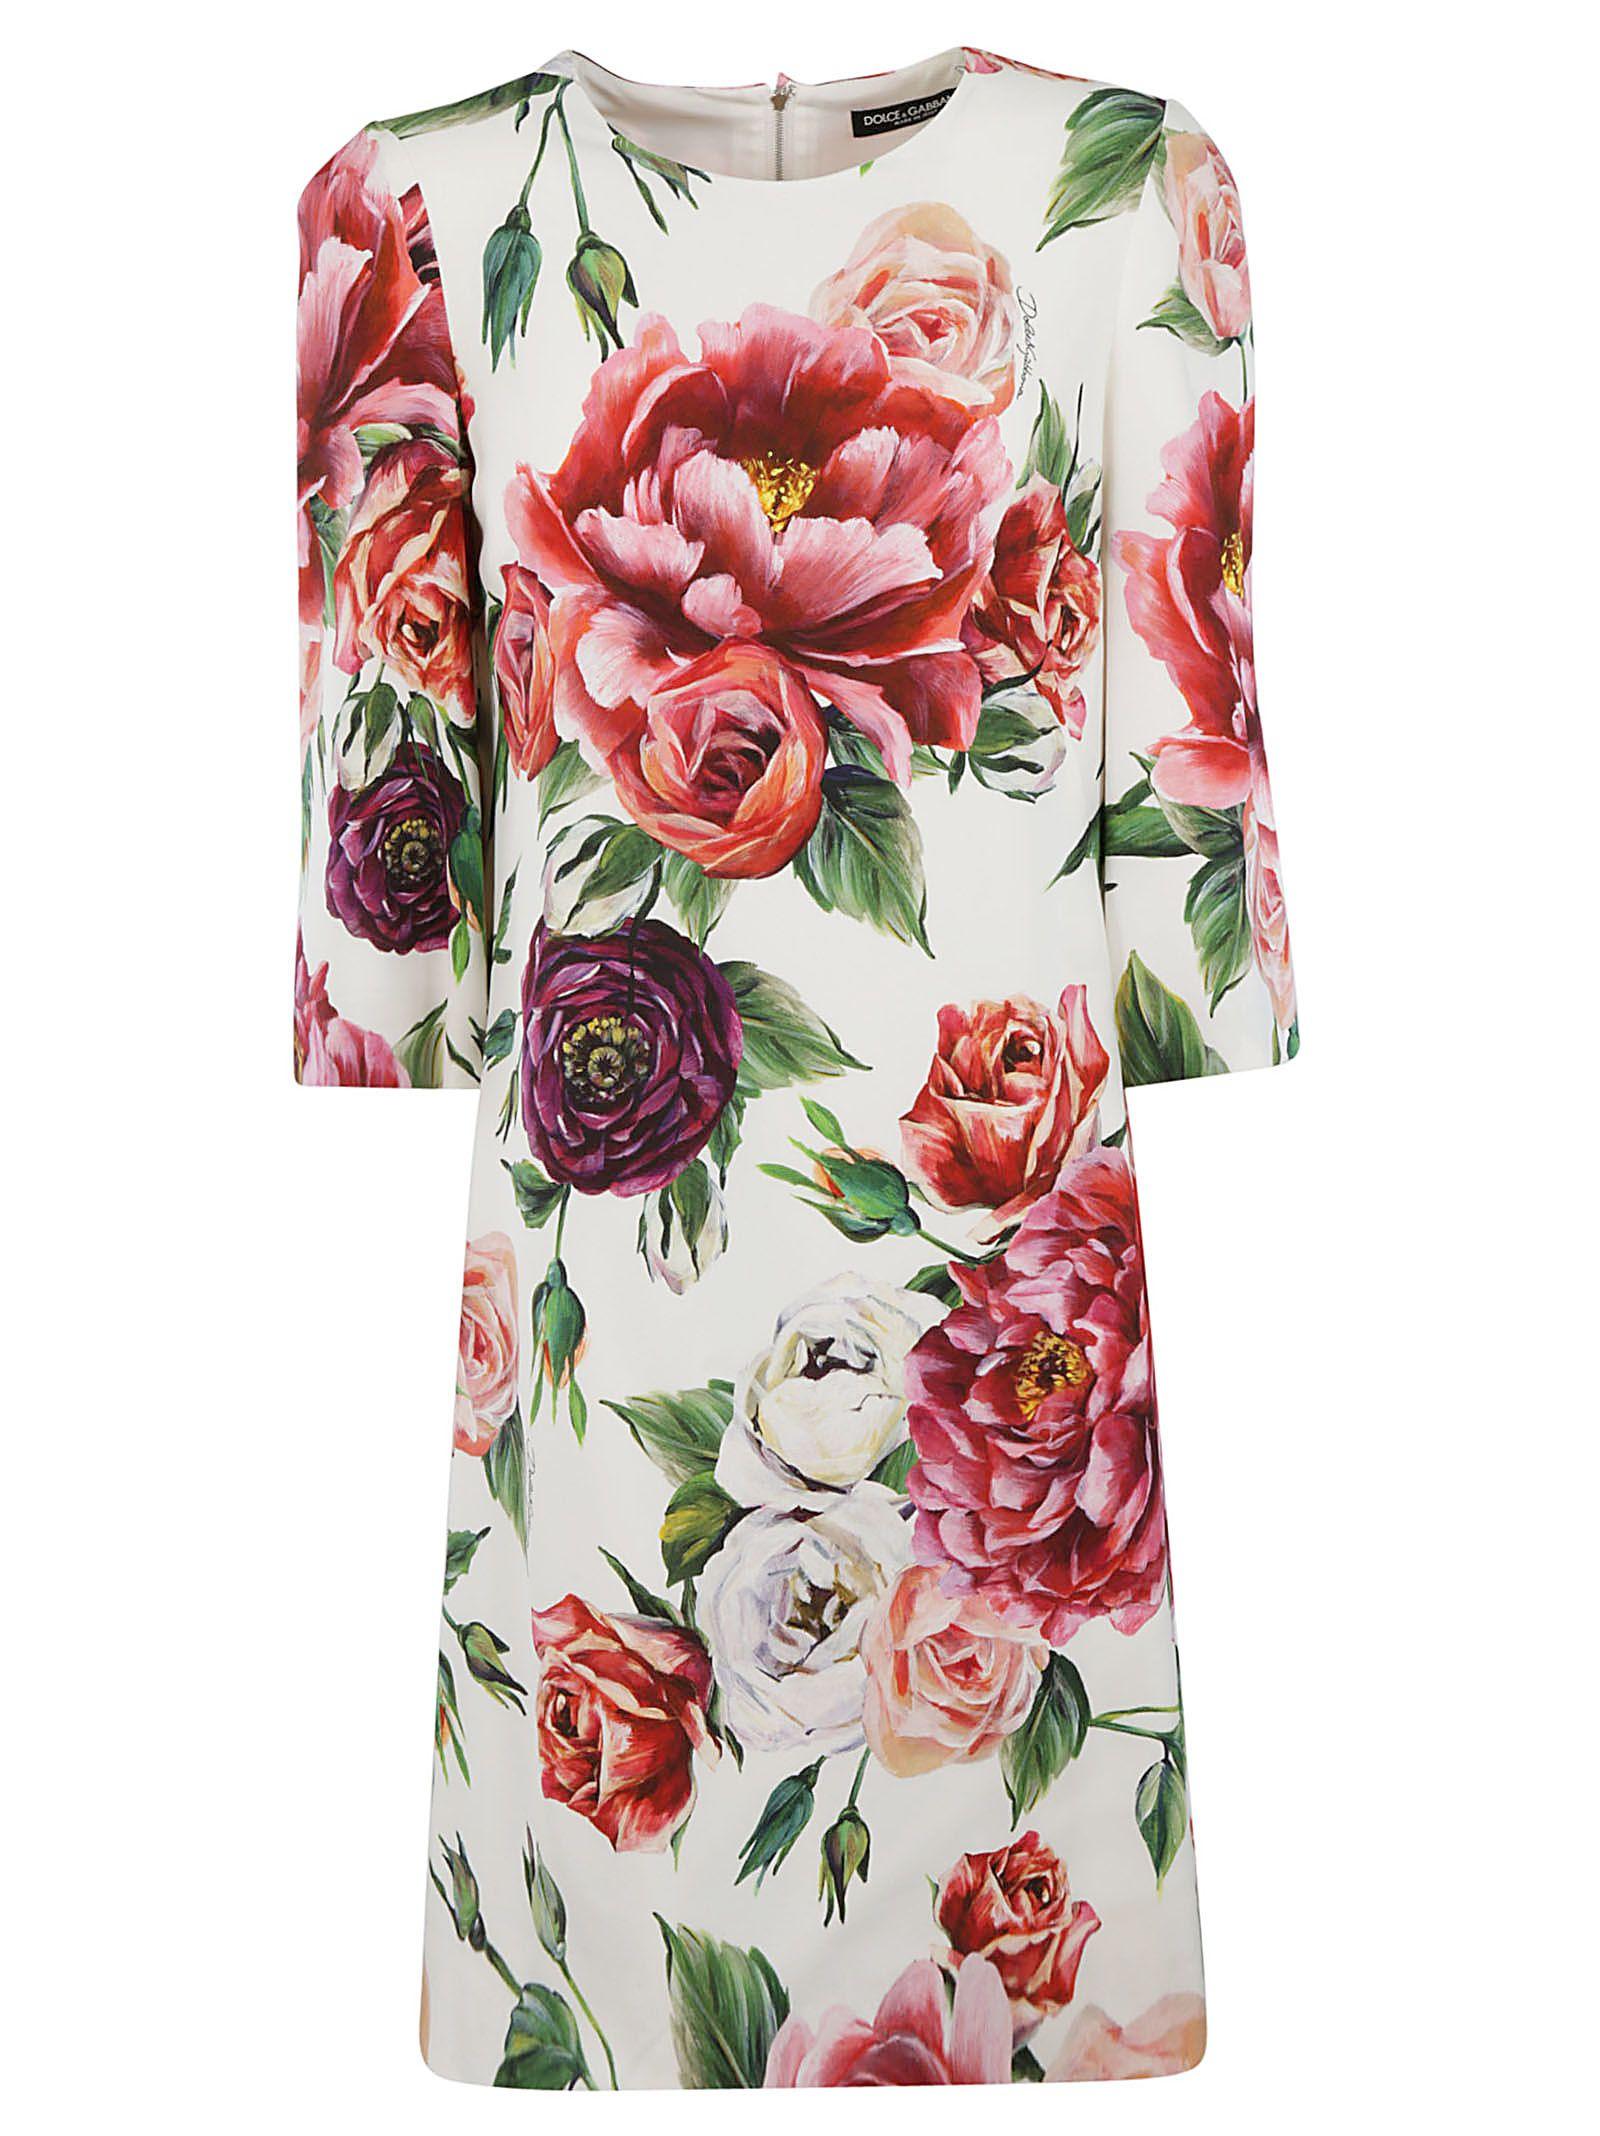 Dolce & Gabbana Silk Rose Print Dress